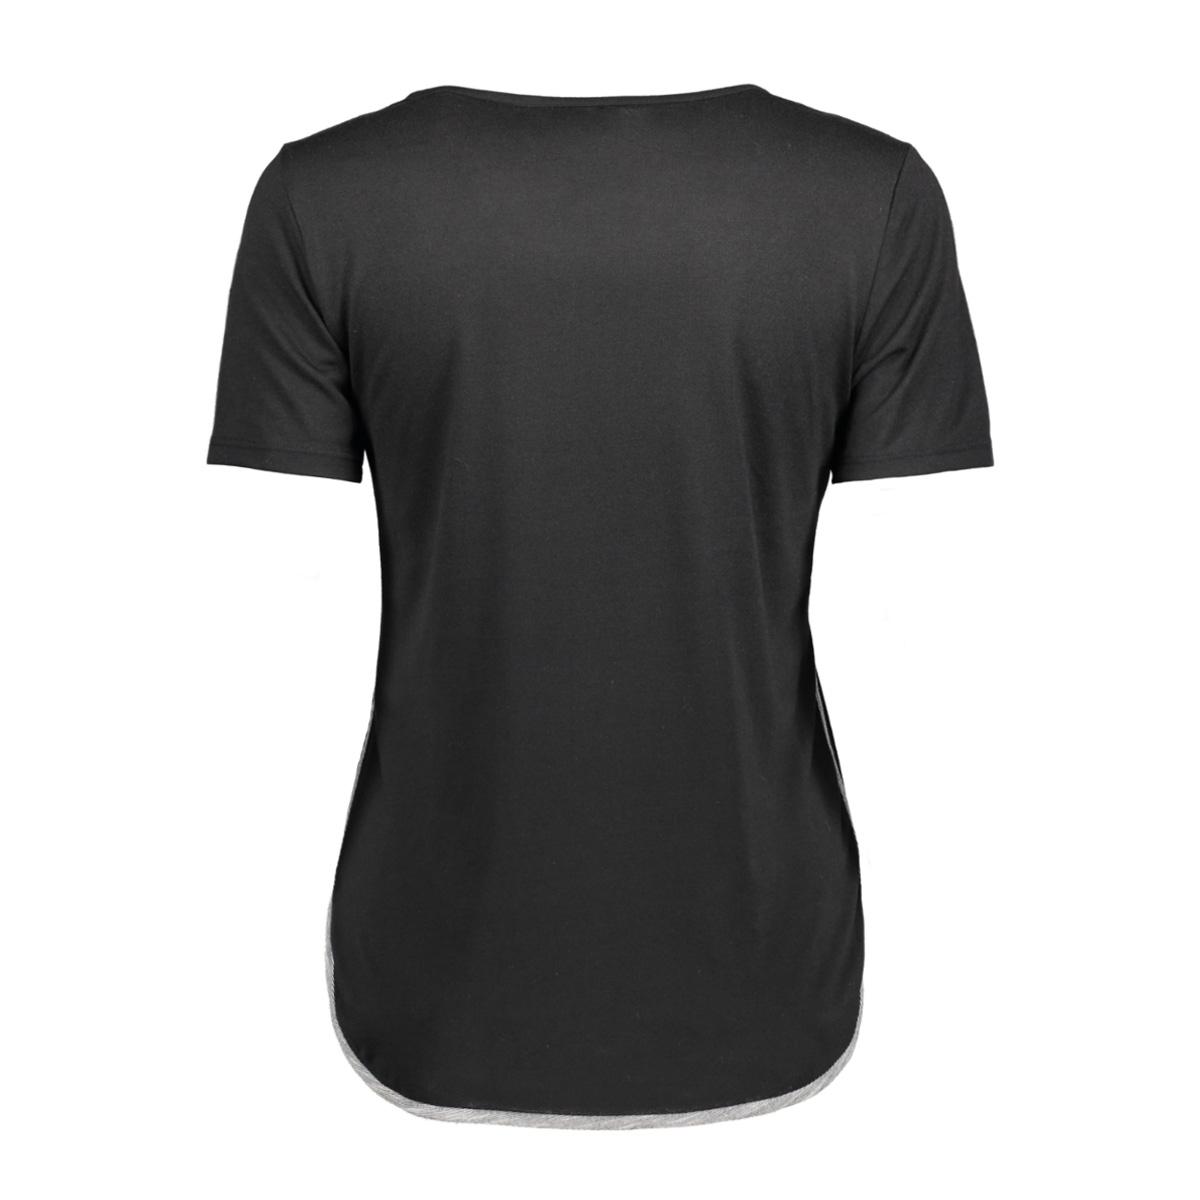 onpnanna ss tee 15135116 only play sport shirt black/black mela